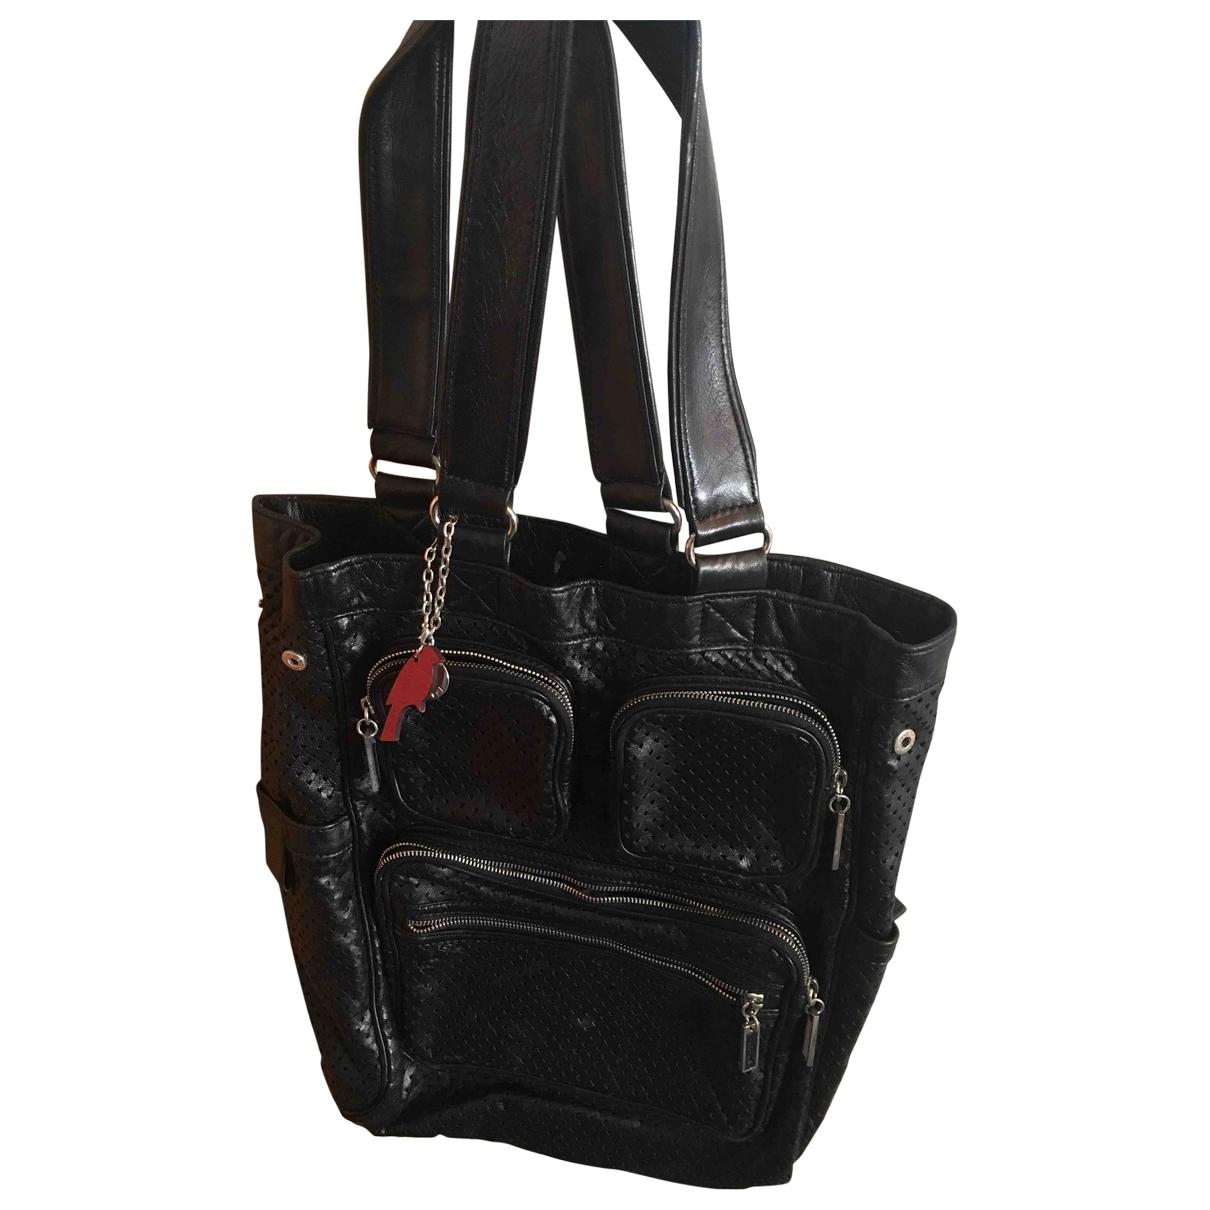 Cacharel \N Black Leather handbag for Women \N